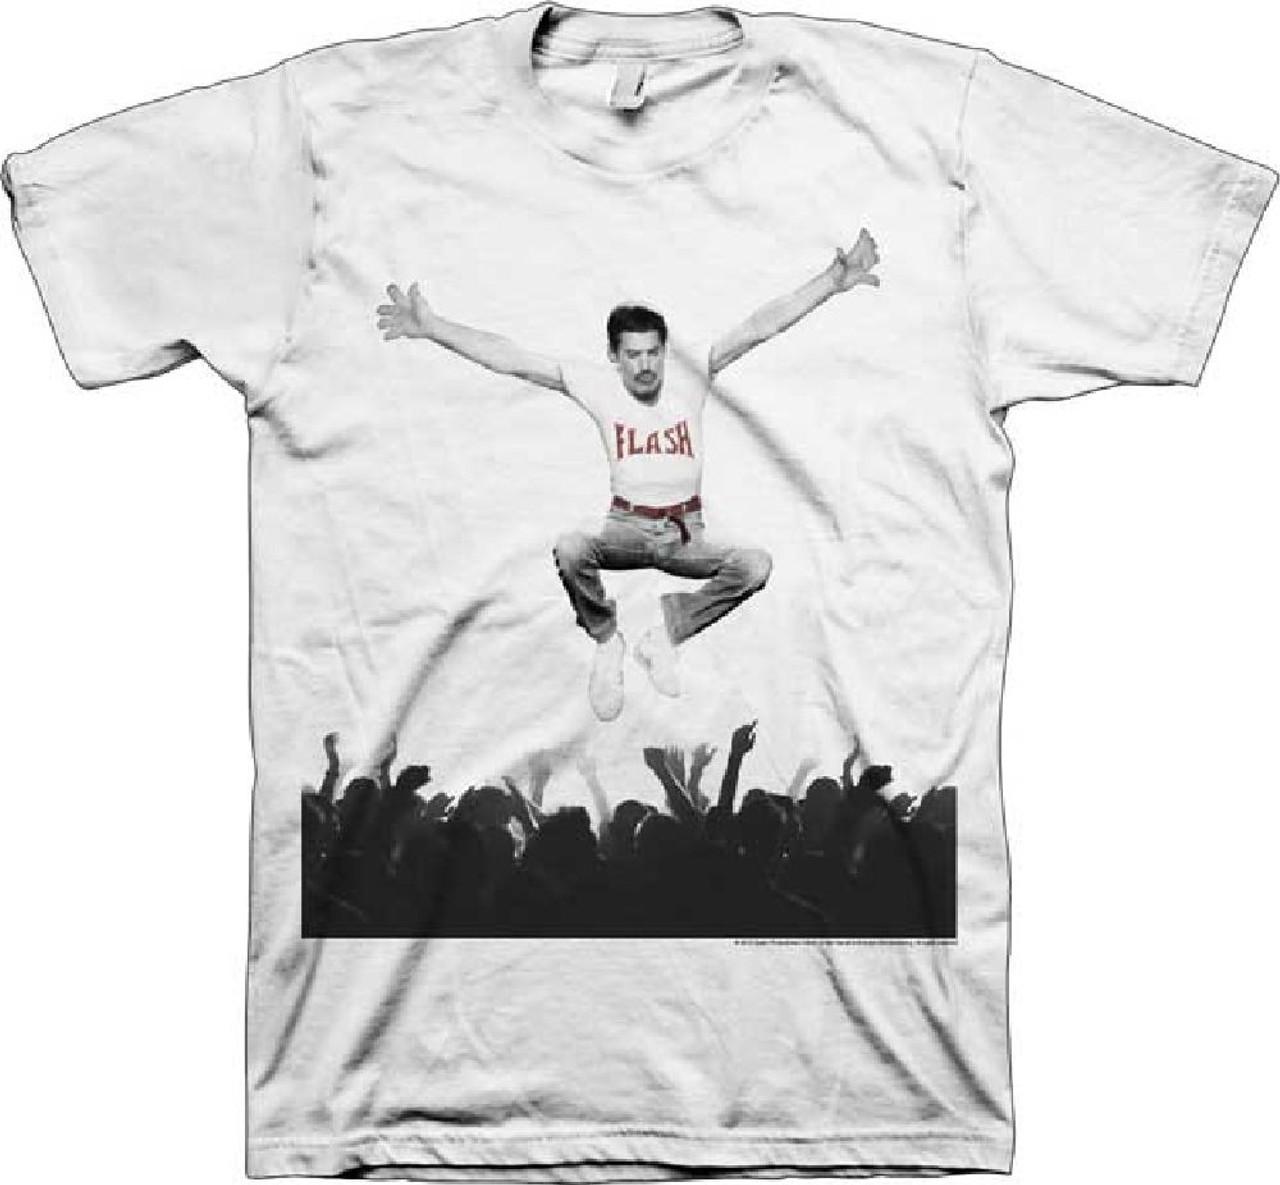 bffa18ef Freddie Mercury Jumping Above Concert Crowd Men's White T-shirt